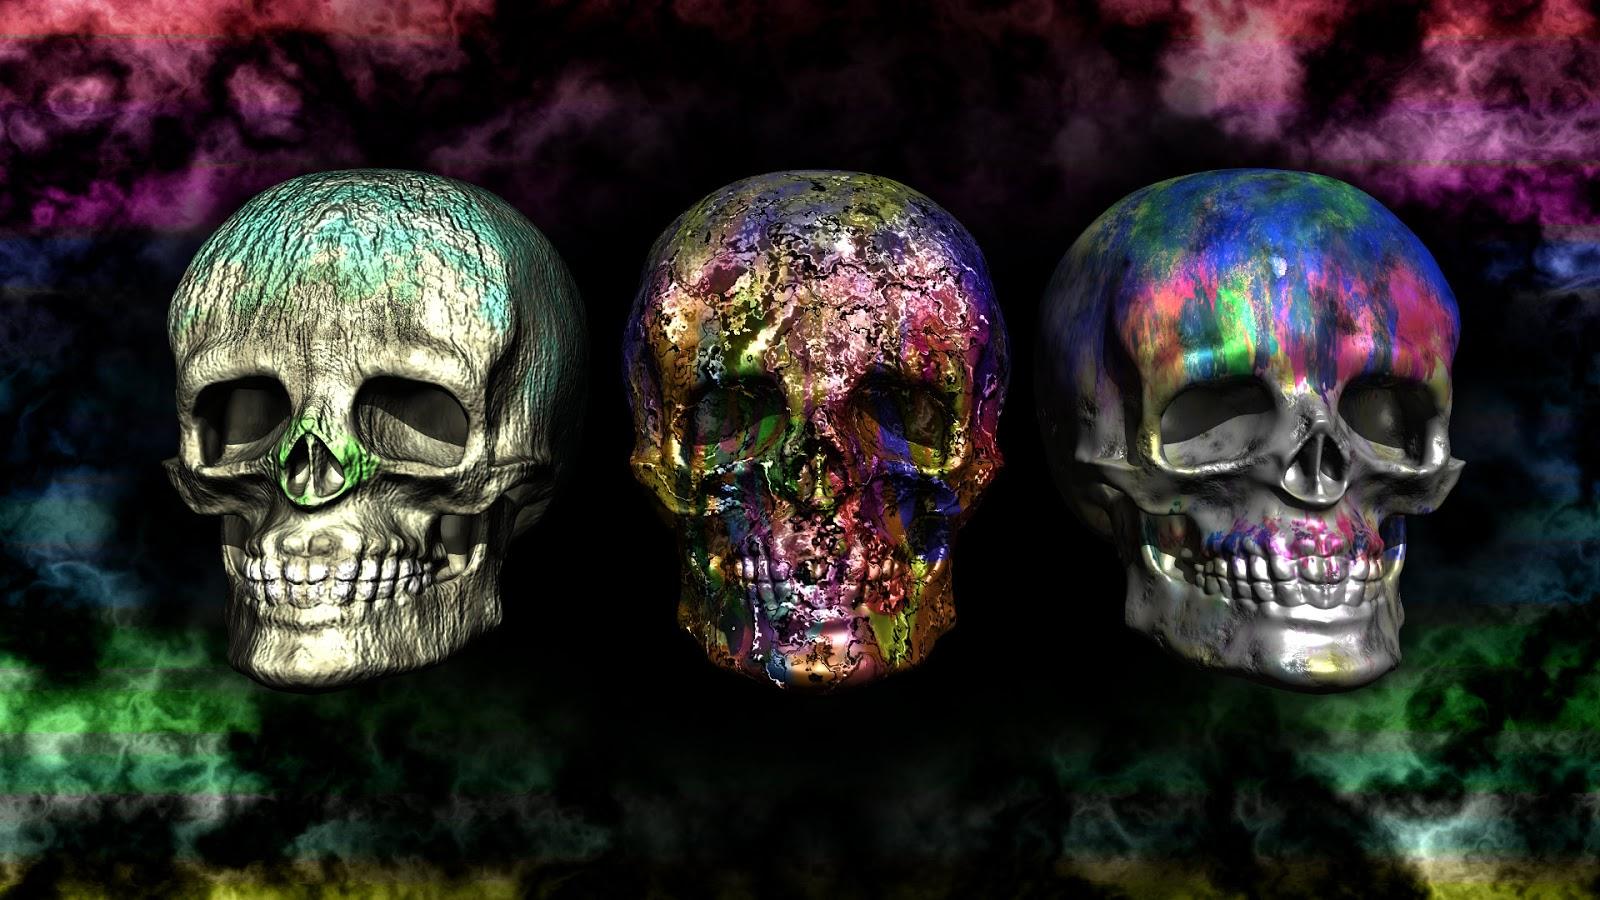 Digitalmatt Blog Sfondi Per Desktop Teschi Wallpapers Skull HD Wallpapers Download Free Images Wallpaper [1000image.com]